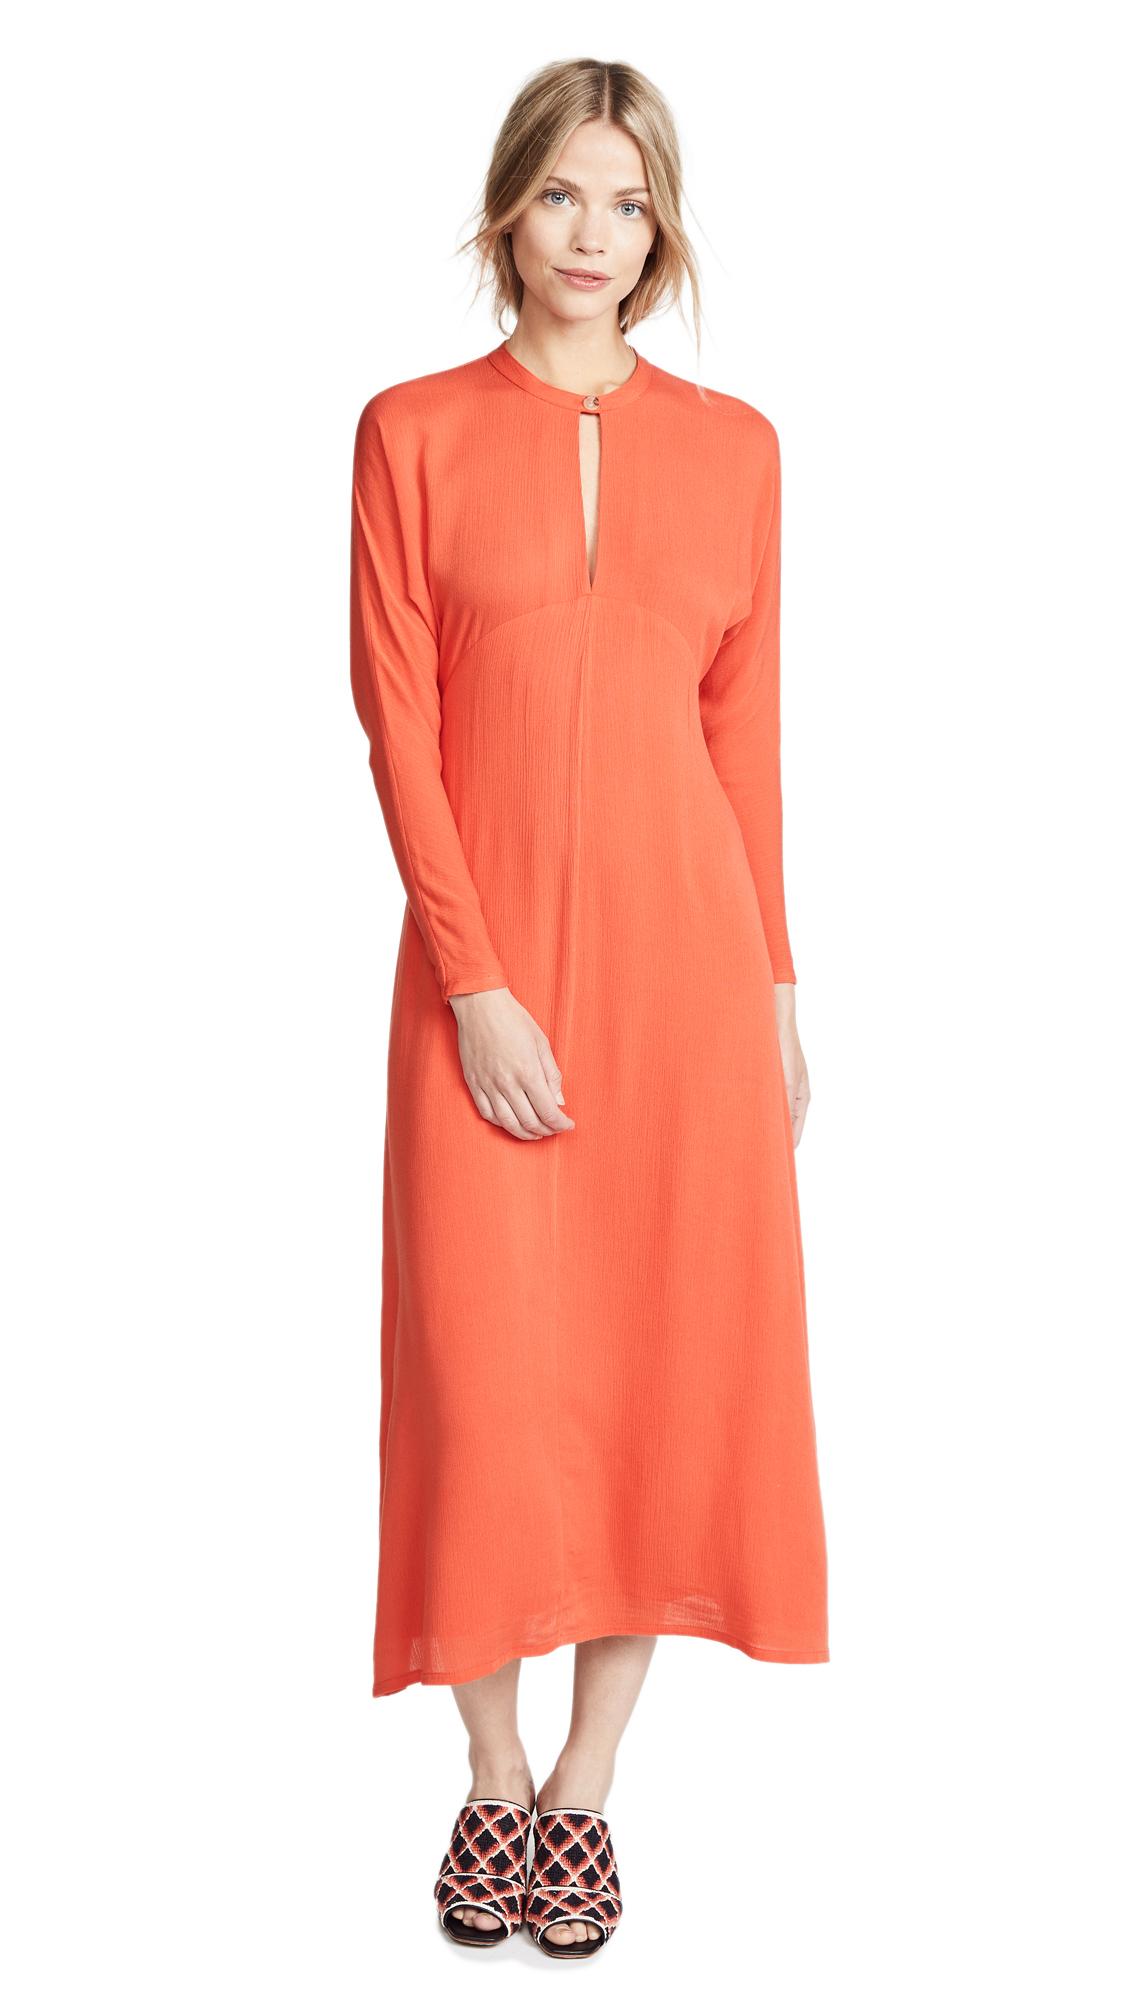 Rachel Comey Carrel Dress - Coral